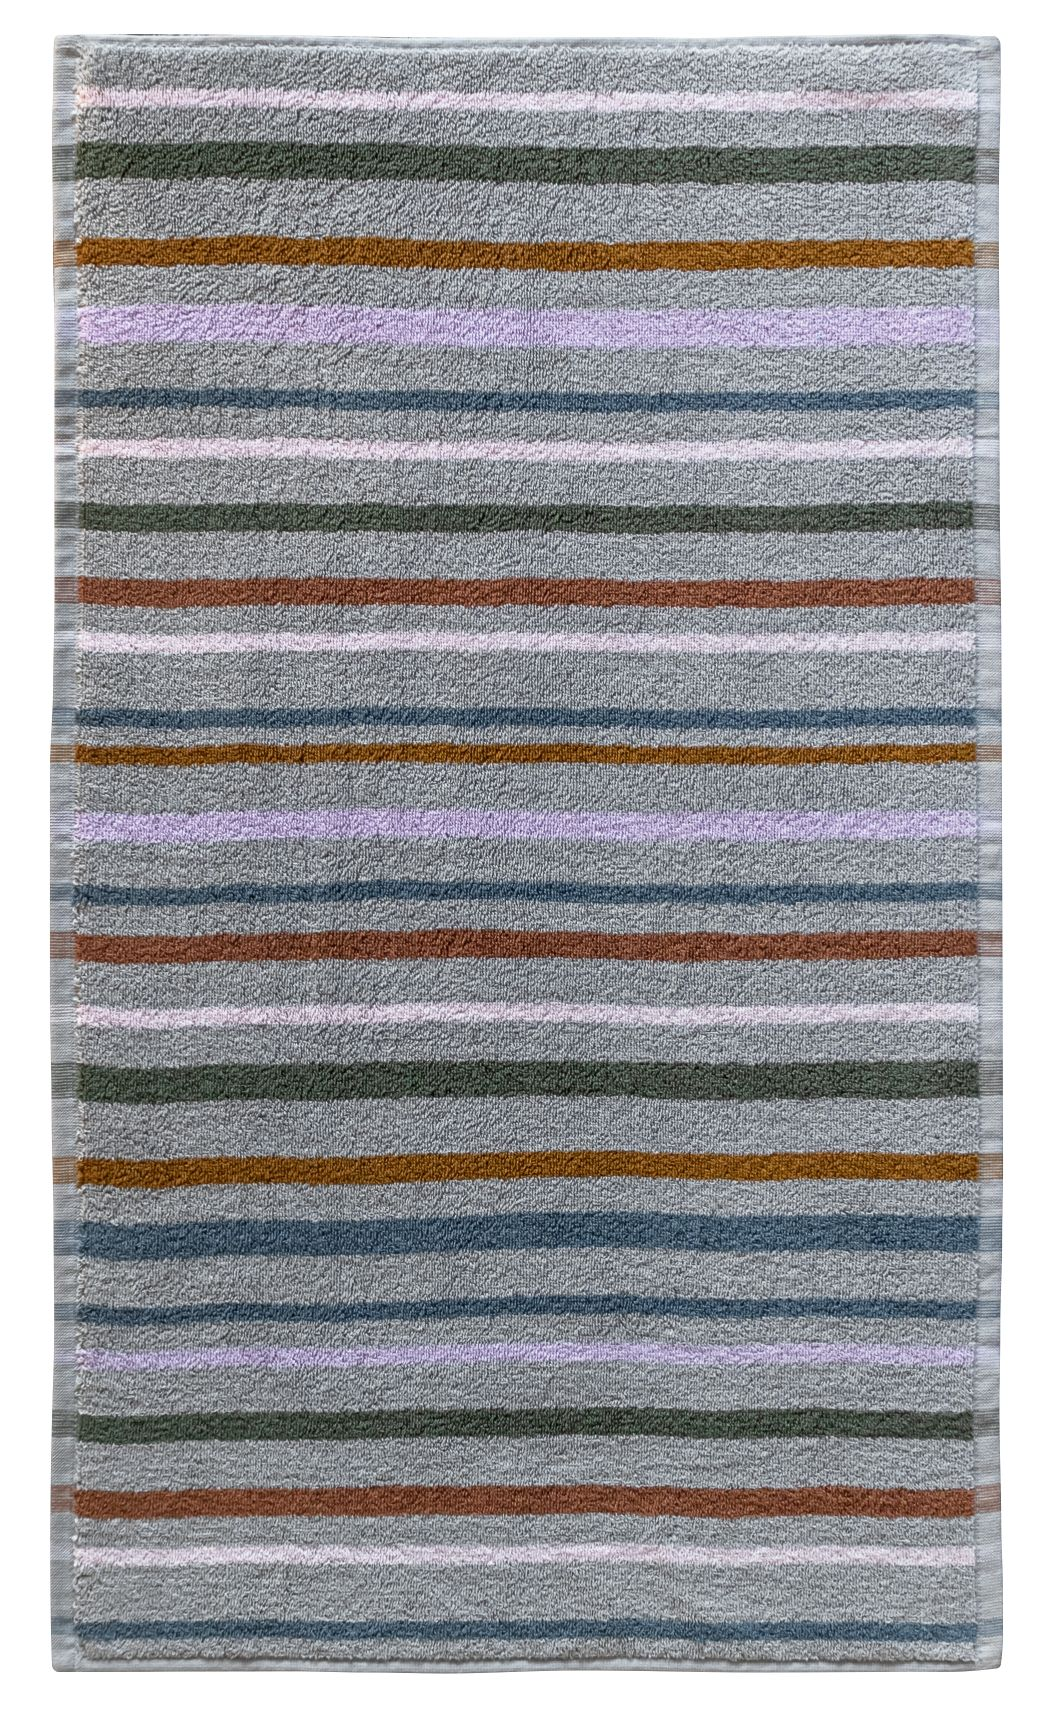 Mette Ditmer Multi håndklæde, 50x86 cm, light grey